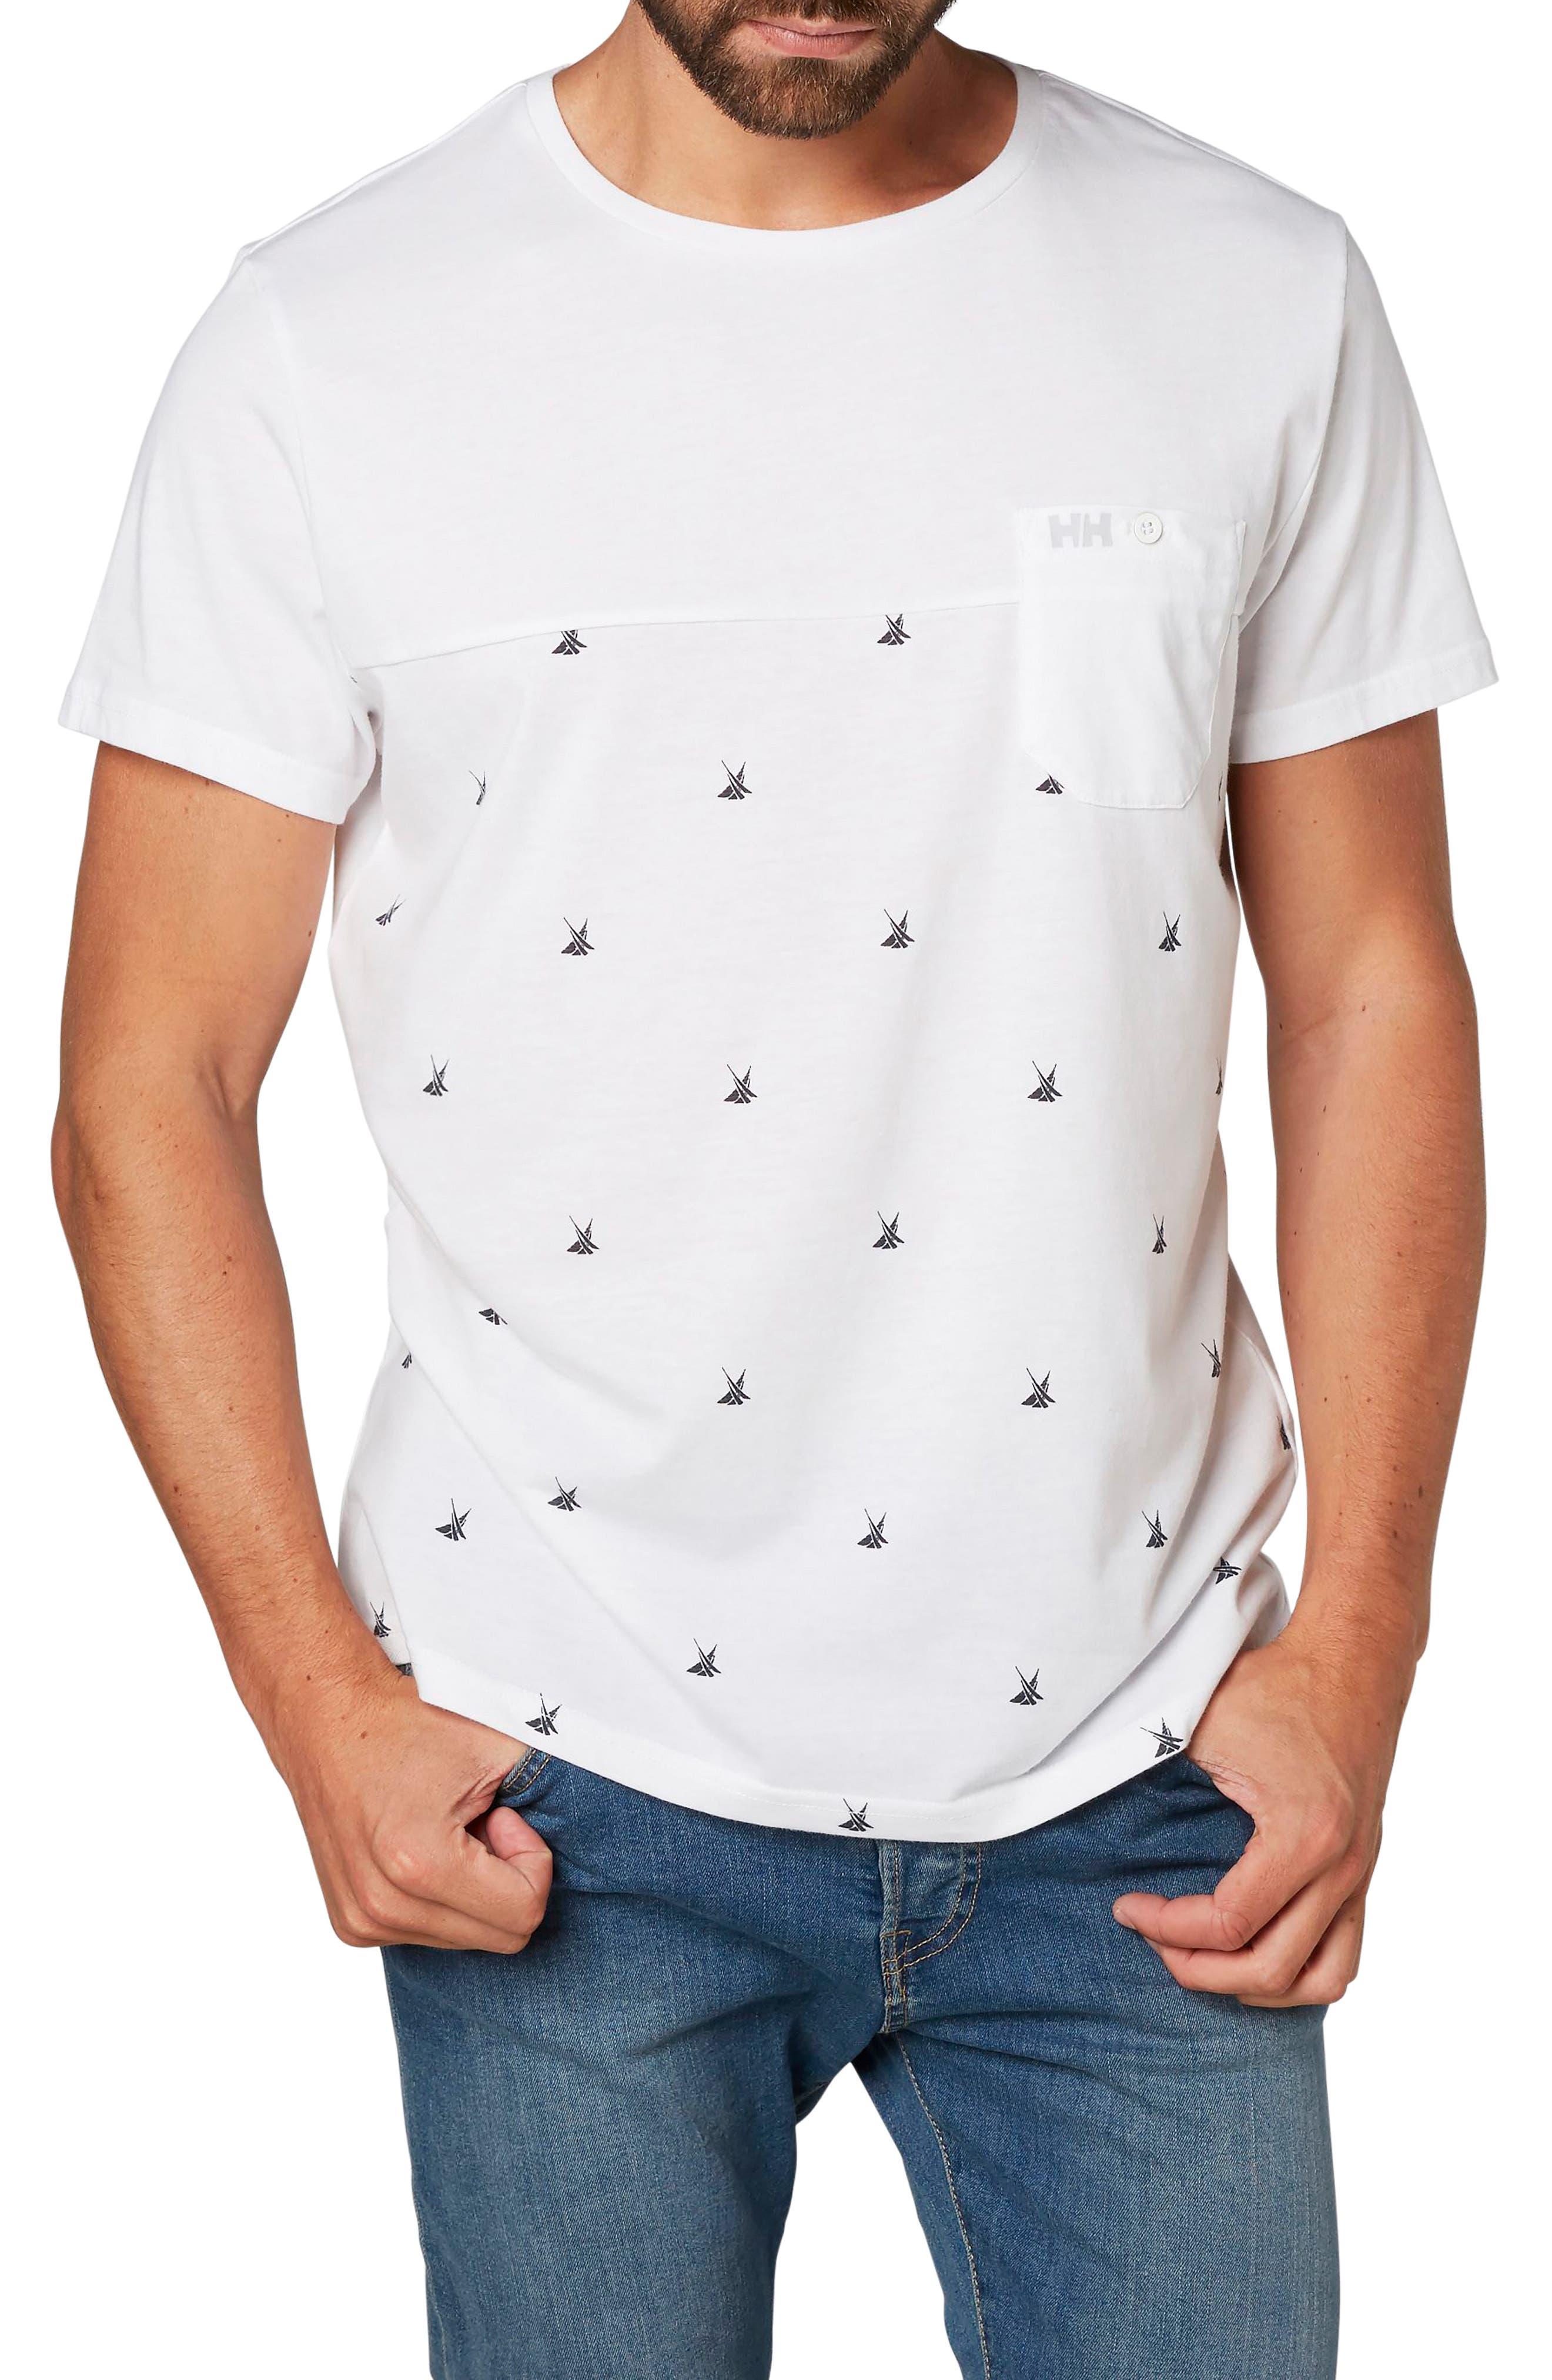 Fjord Cotton Blend T-Shirt,                             Main thumbnail 1, color,                             100